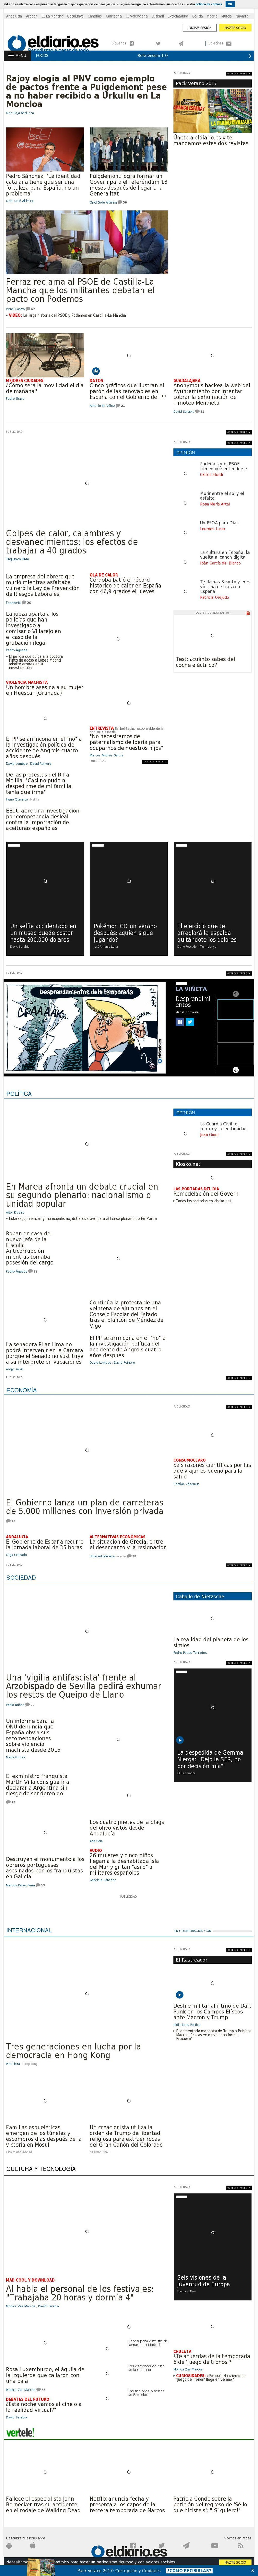 El Diario at Saturday July 15, 2017, 1:06 p.m. UTC